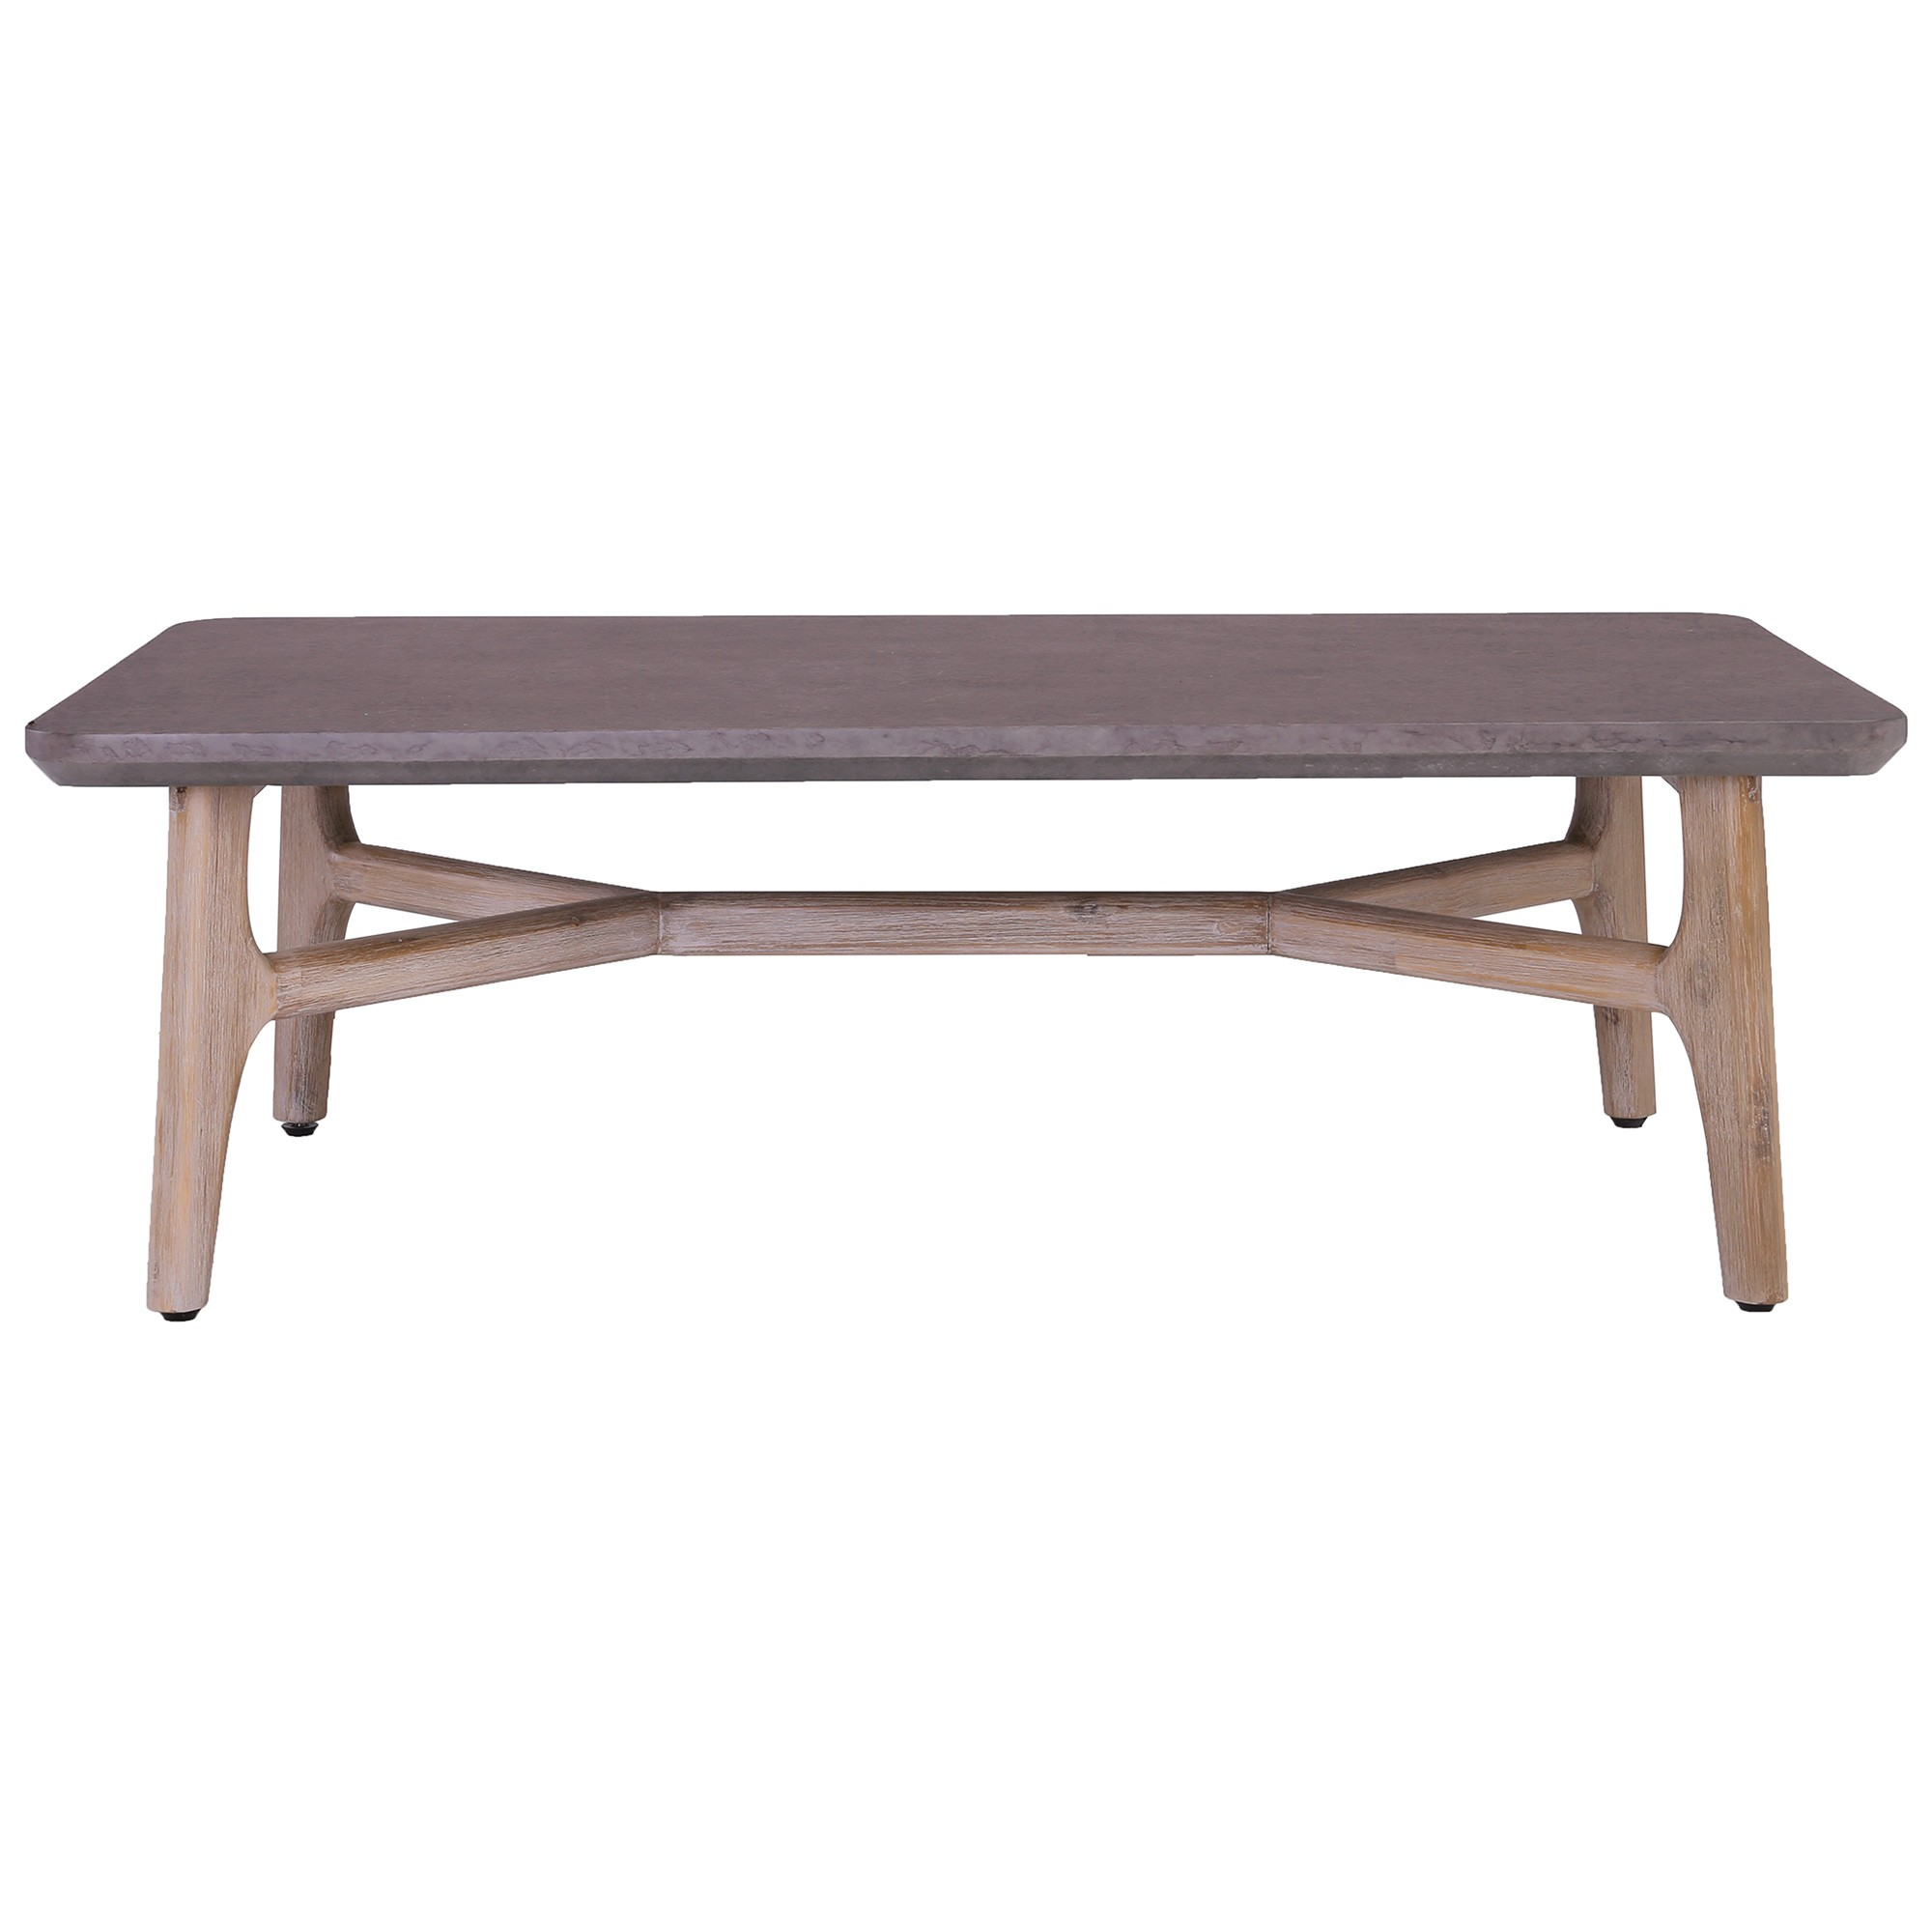 Corbin Acacia Timber Coffee Table, 120cm